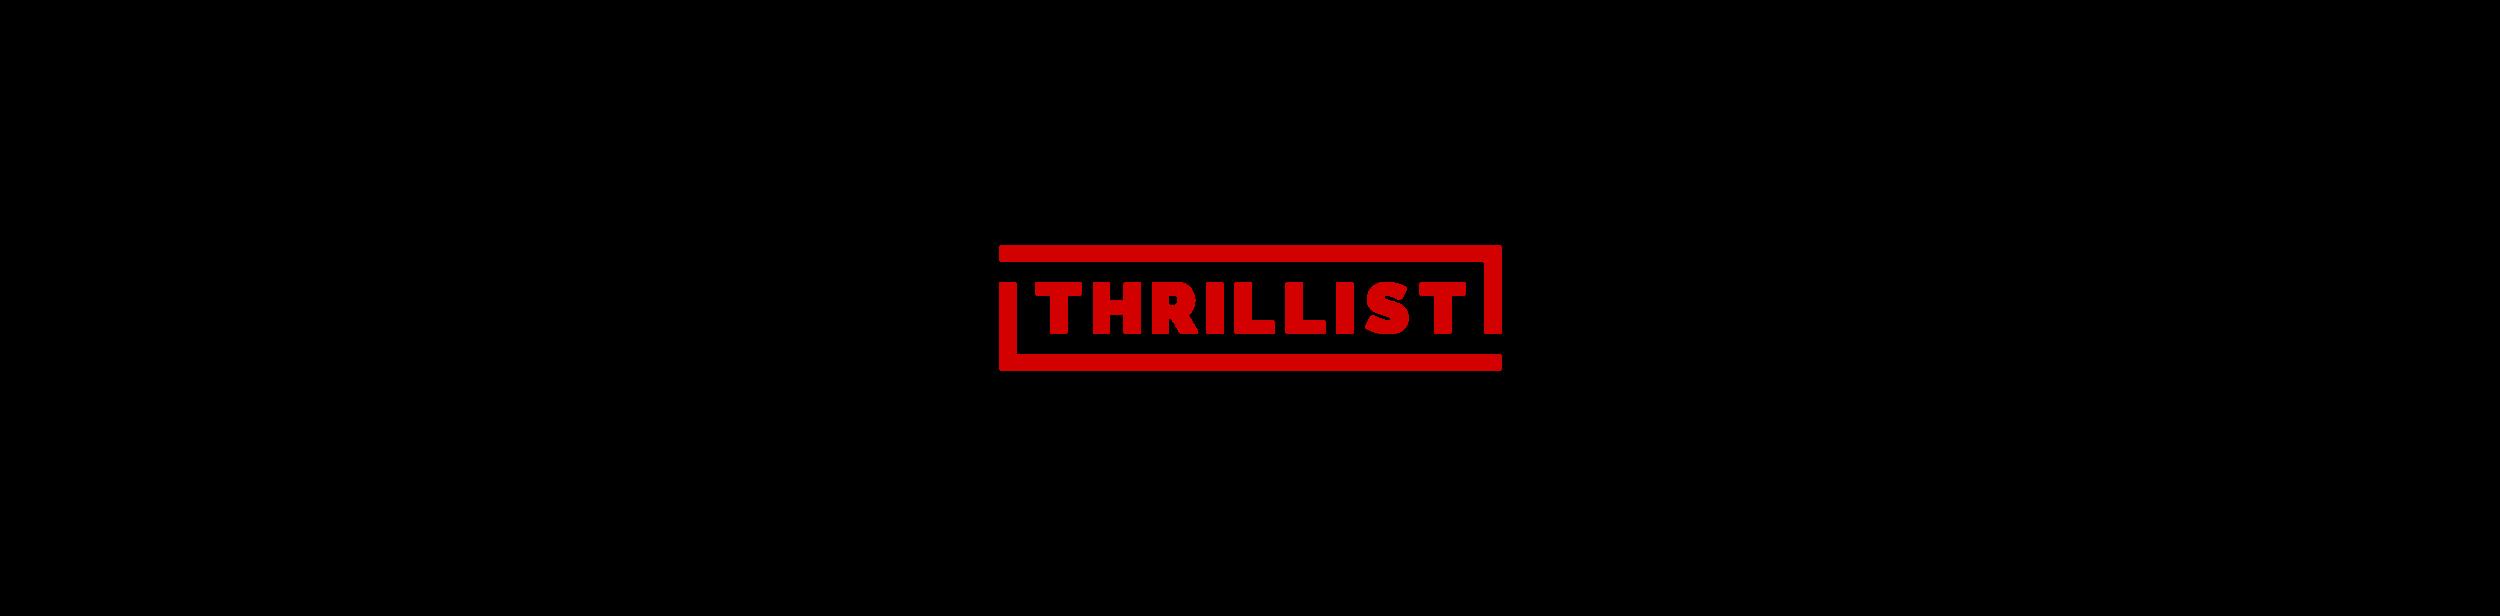 Thrillist_logo-resize.png